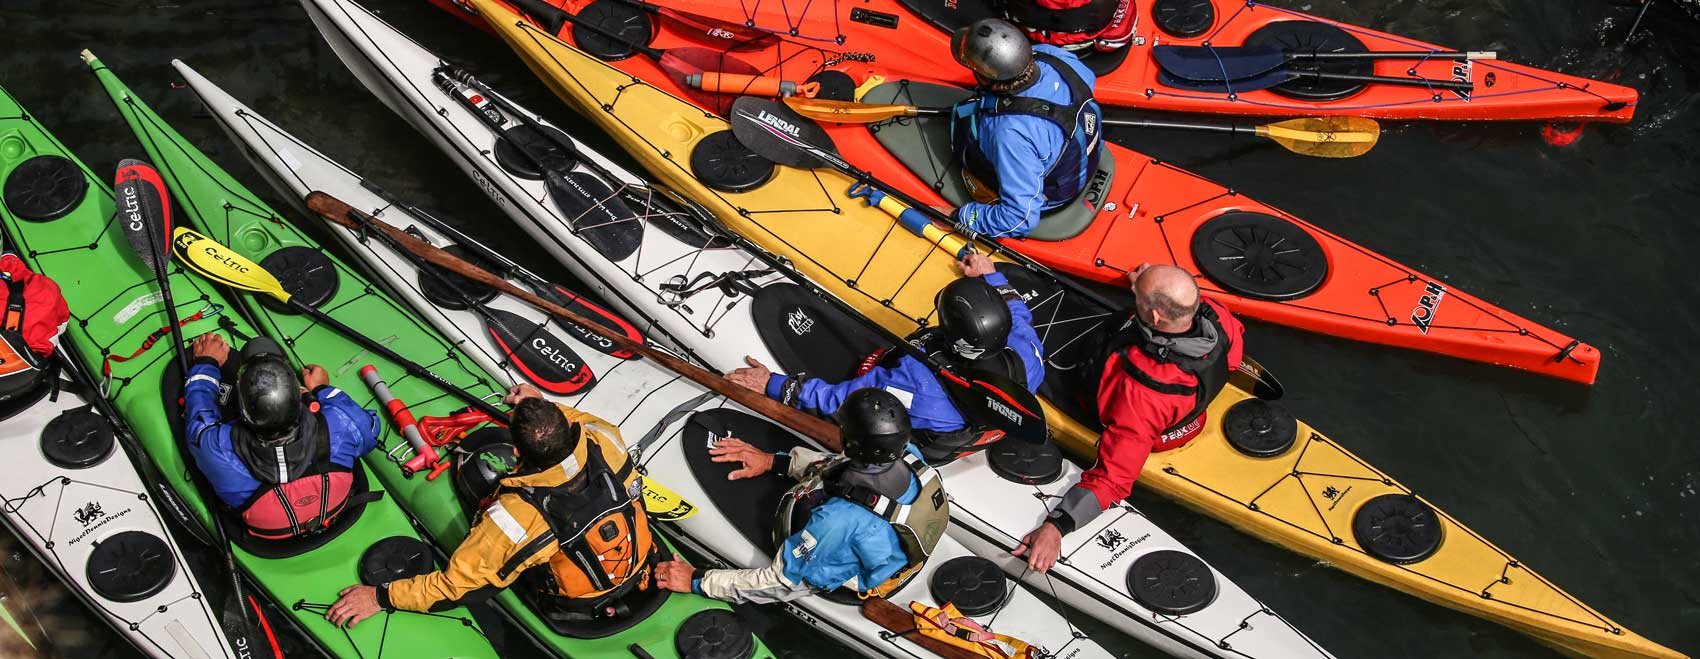 Karitek -Scotland's dealer for sea kayaks by SKUK by Nigel Dennis, Rockpool, P&H and more